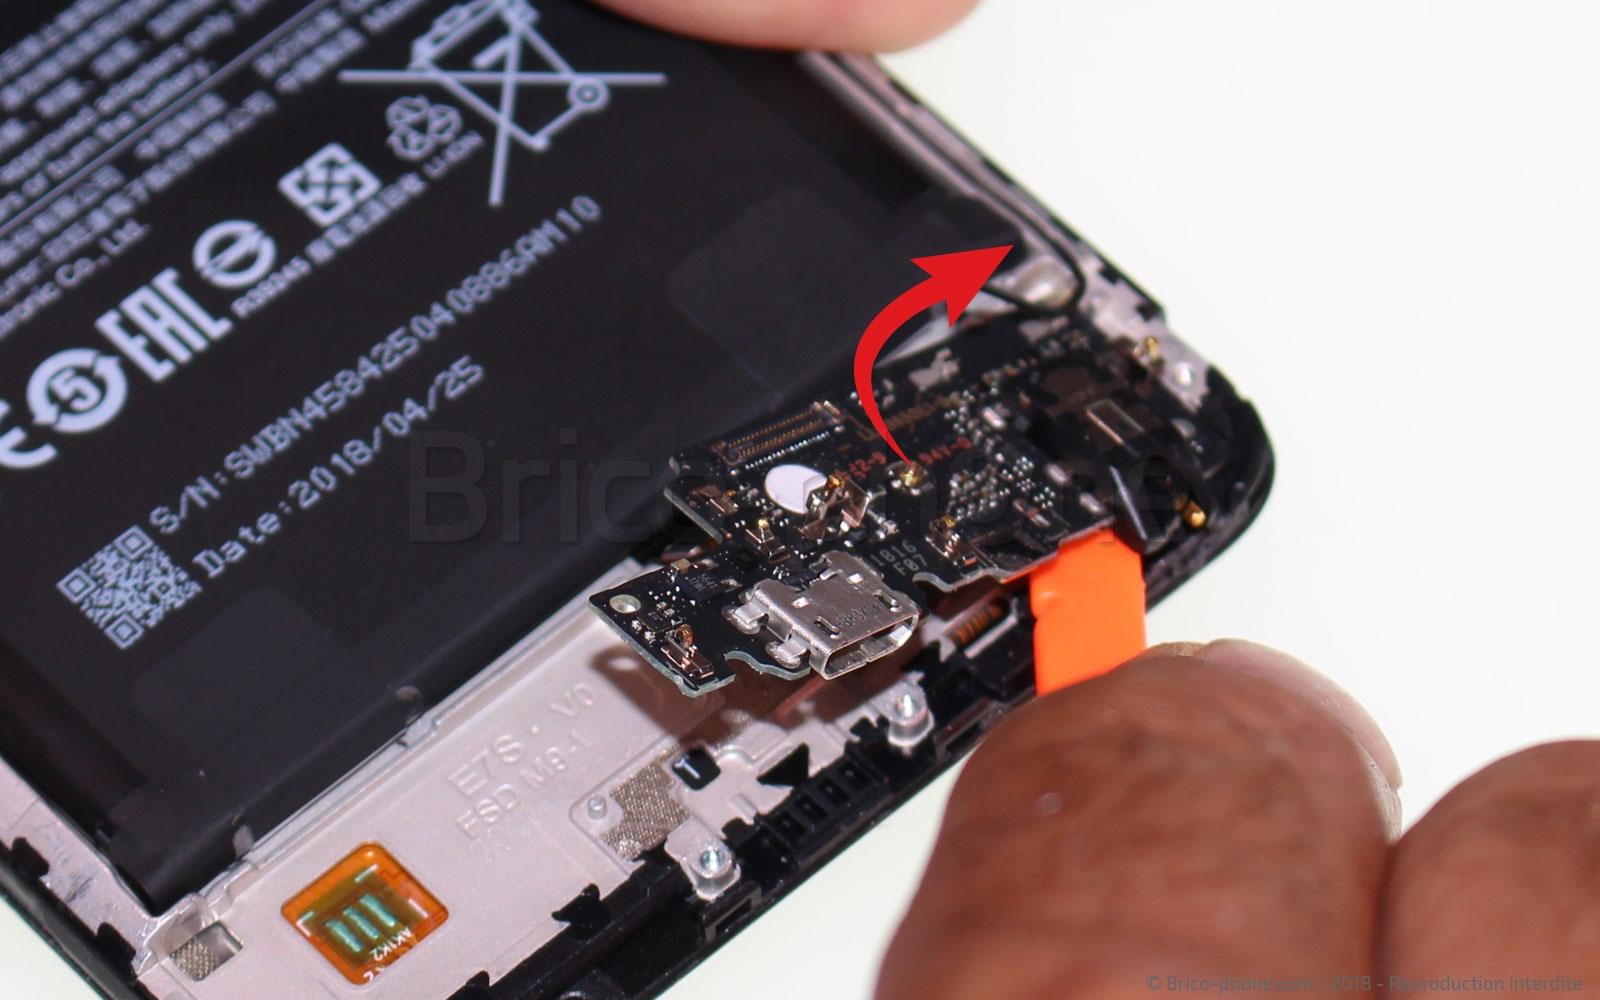 Etape 7 : Retirer  la carte USB